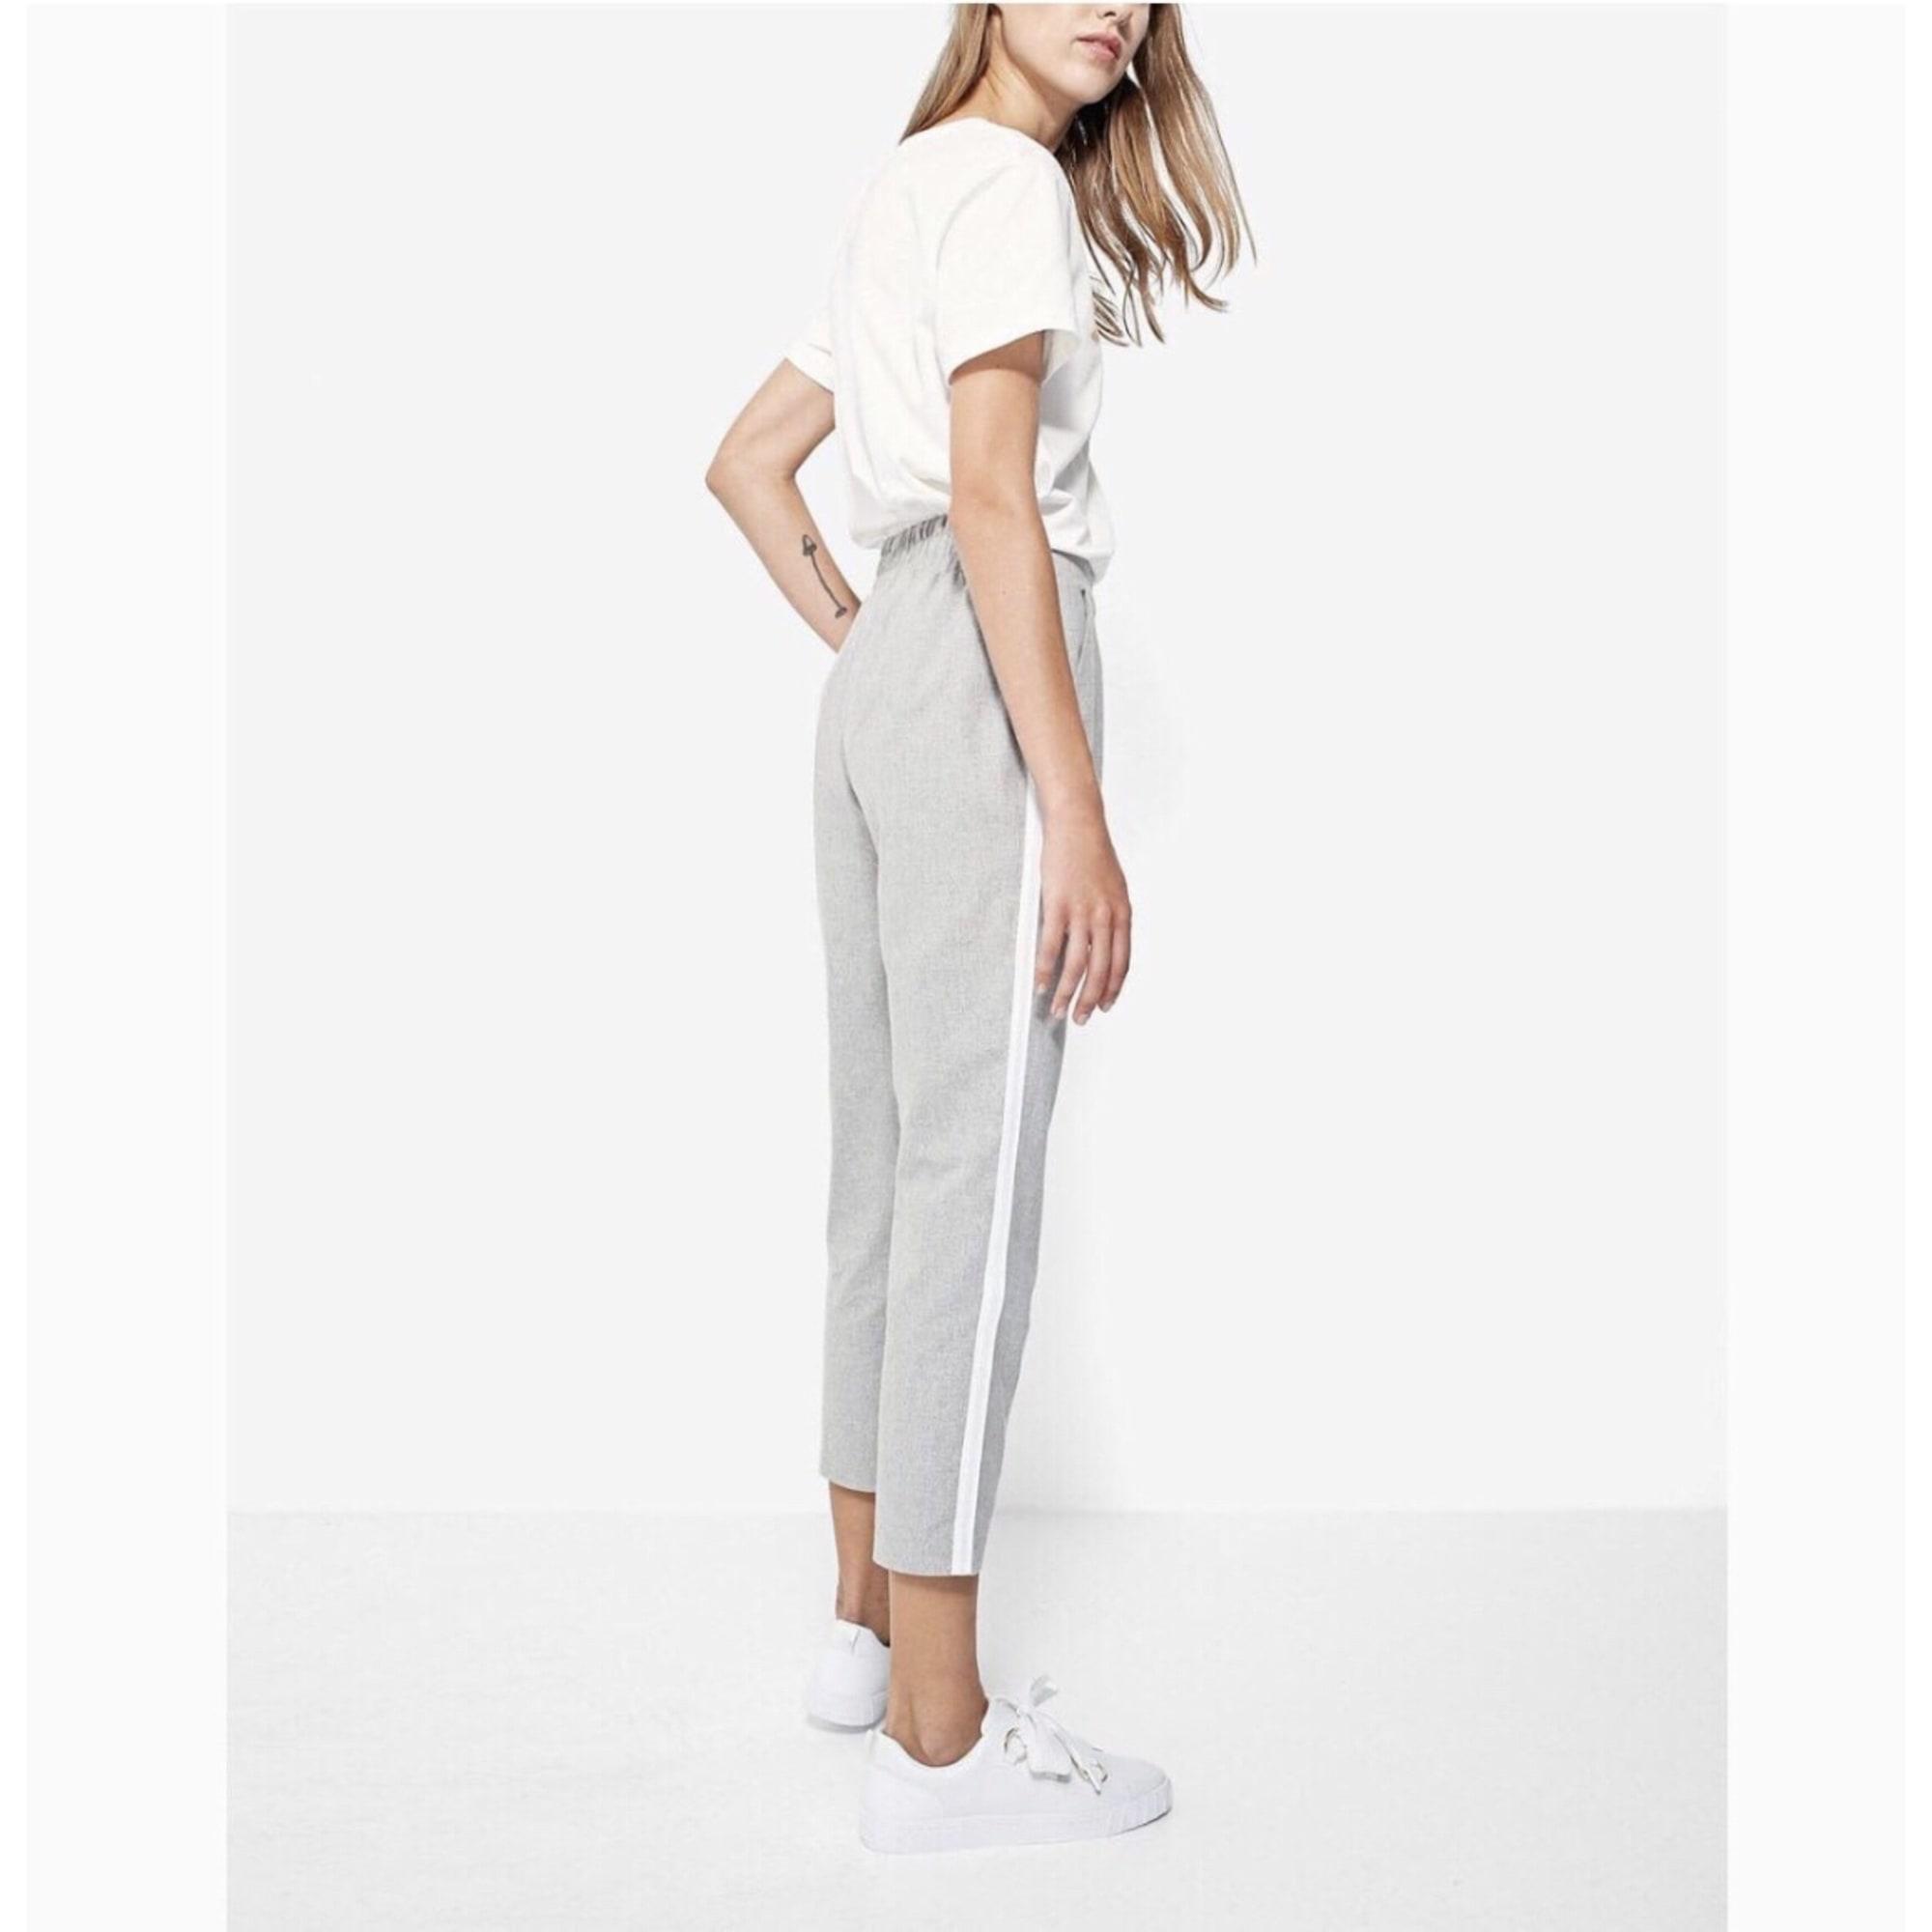 classic fit reliable quality online for sale Medio NoticiasPantalon Femme Zara Top Carotte 10 Punto KcFl1J